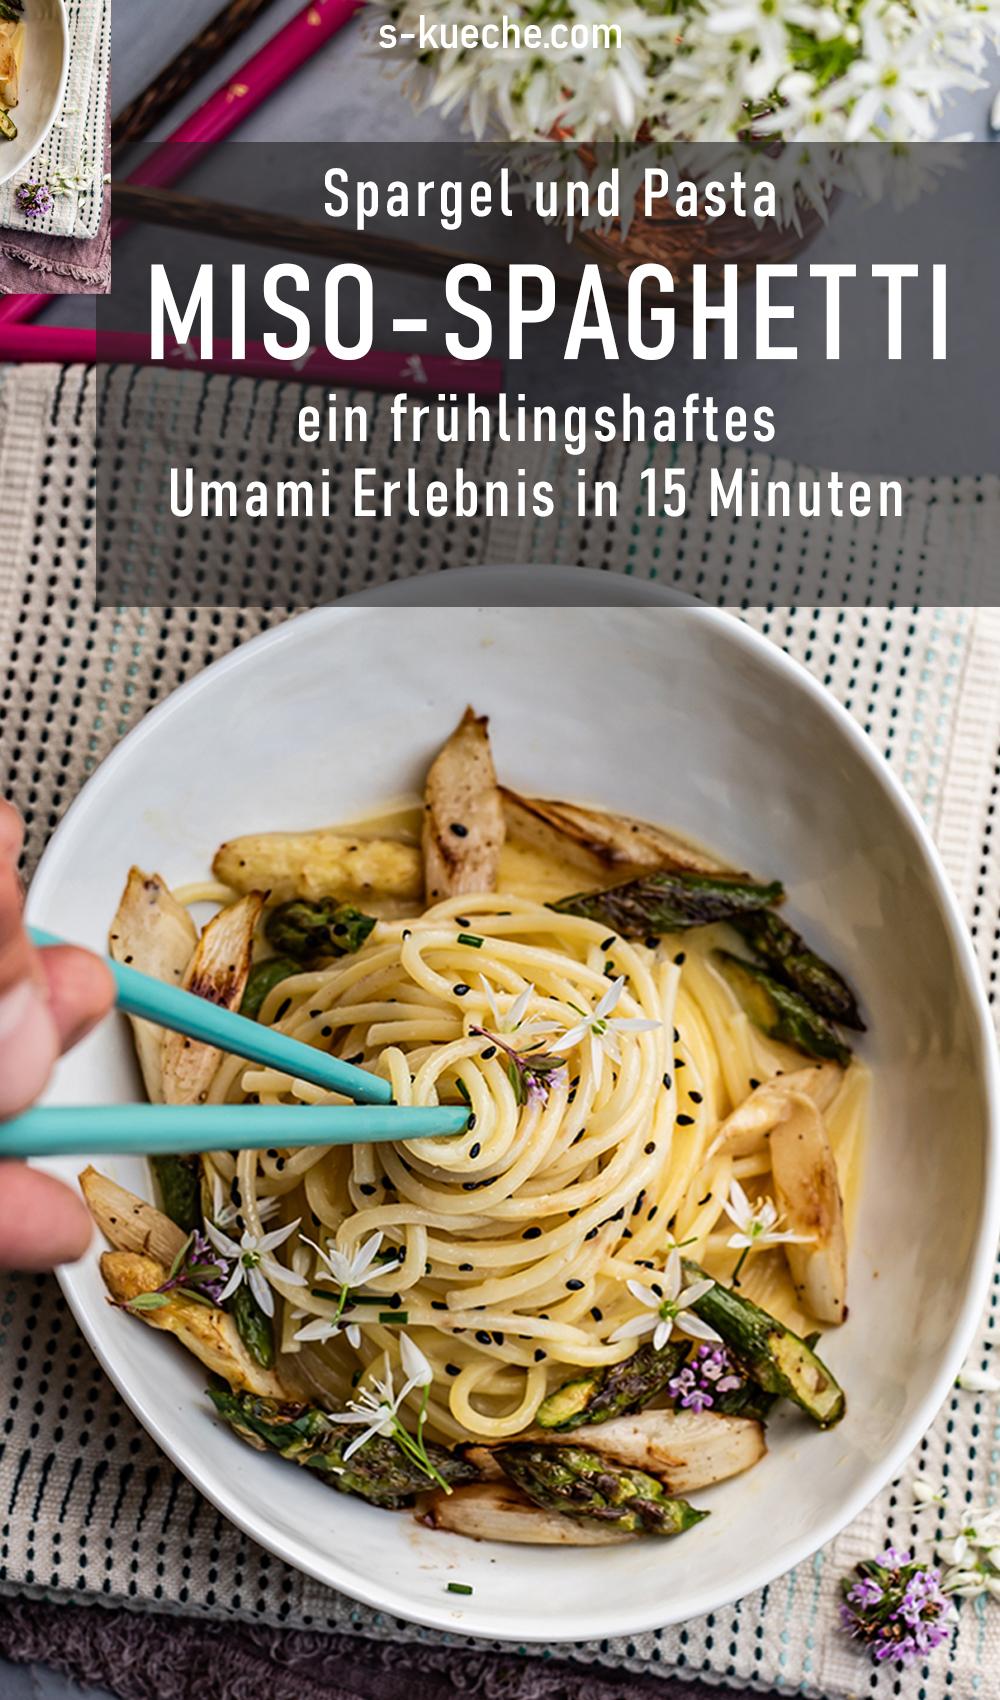 Miso Spaghetti mit buntem Spargel